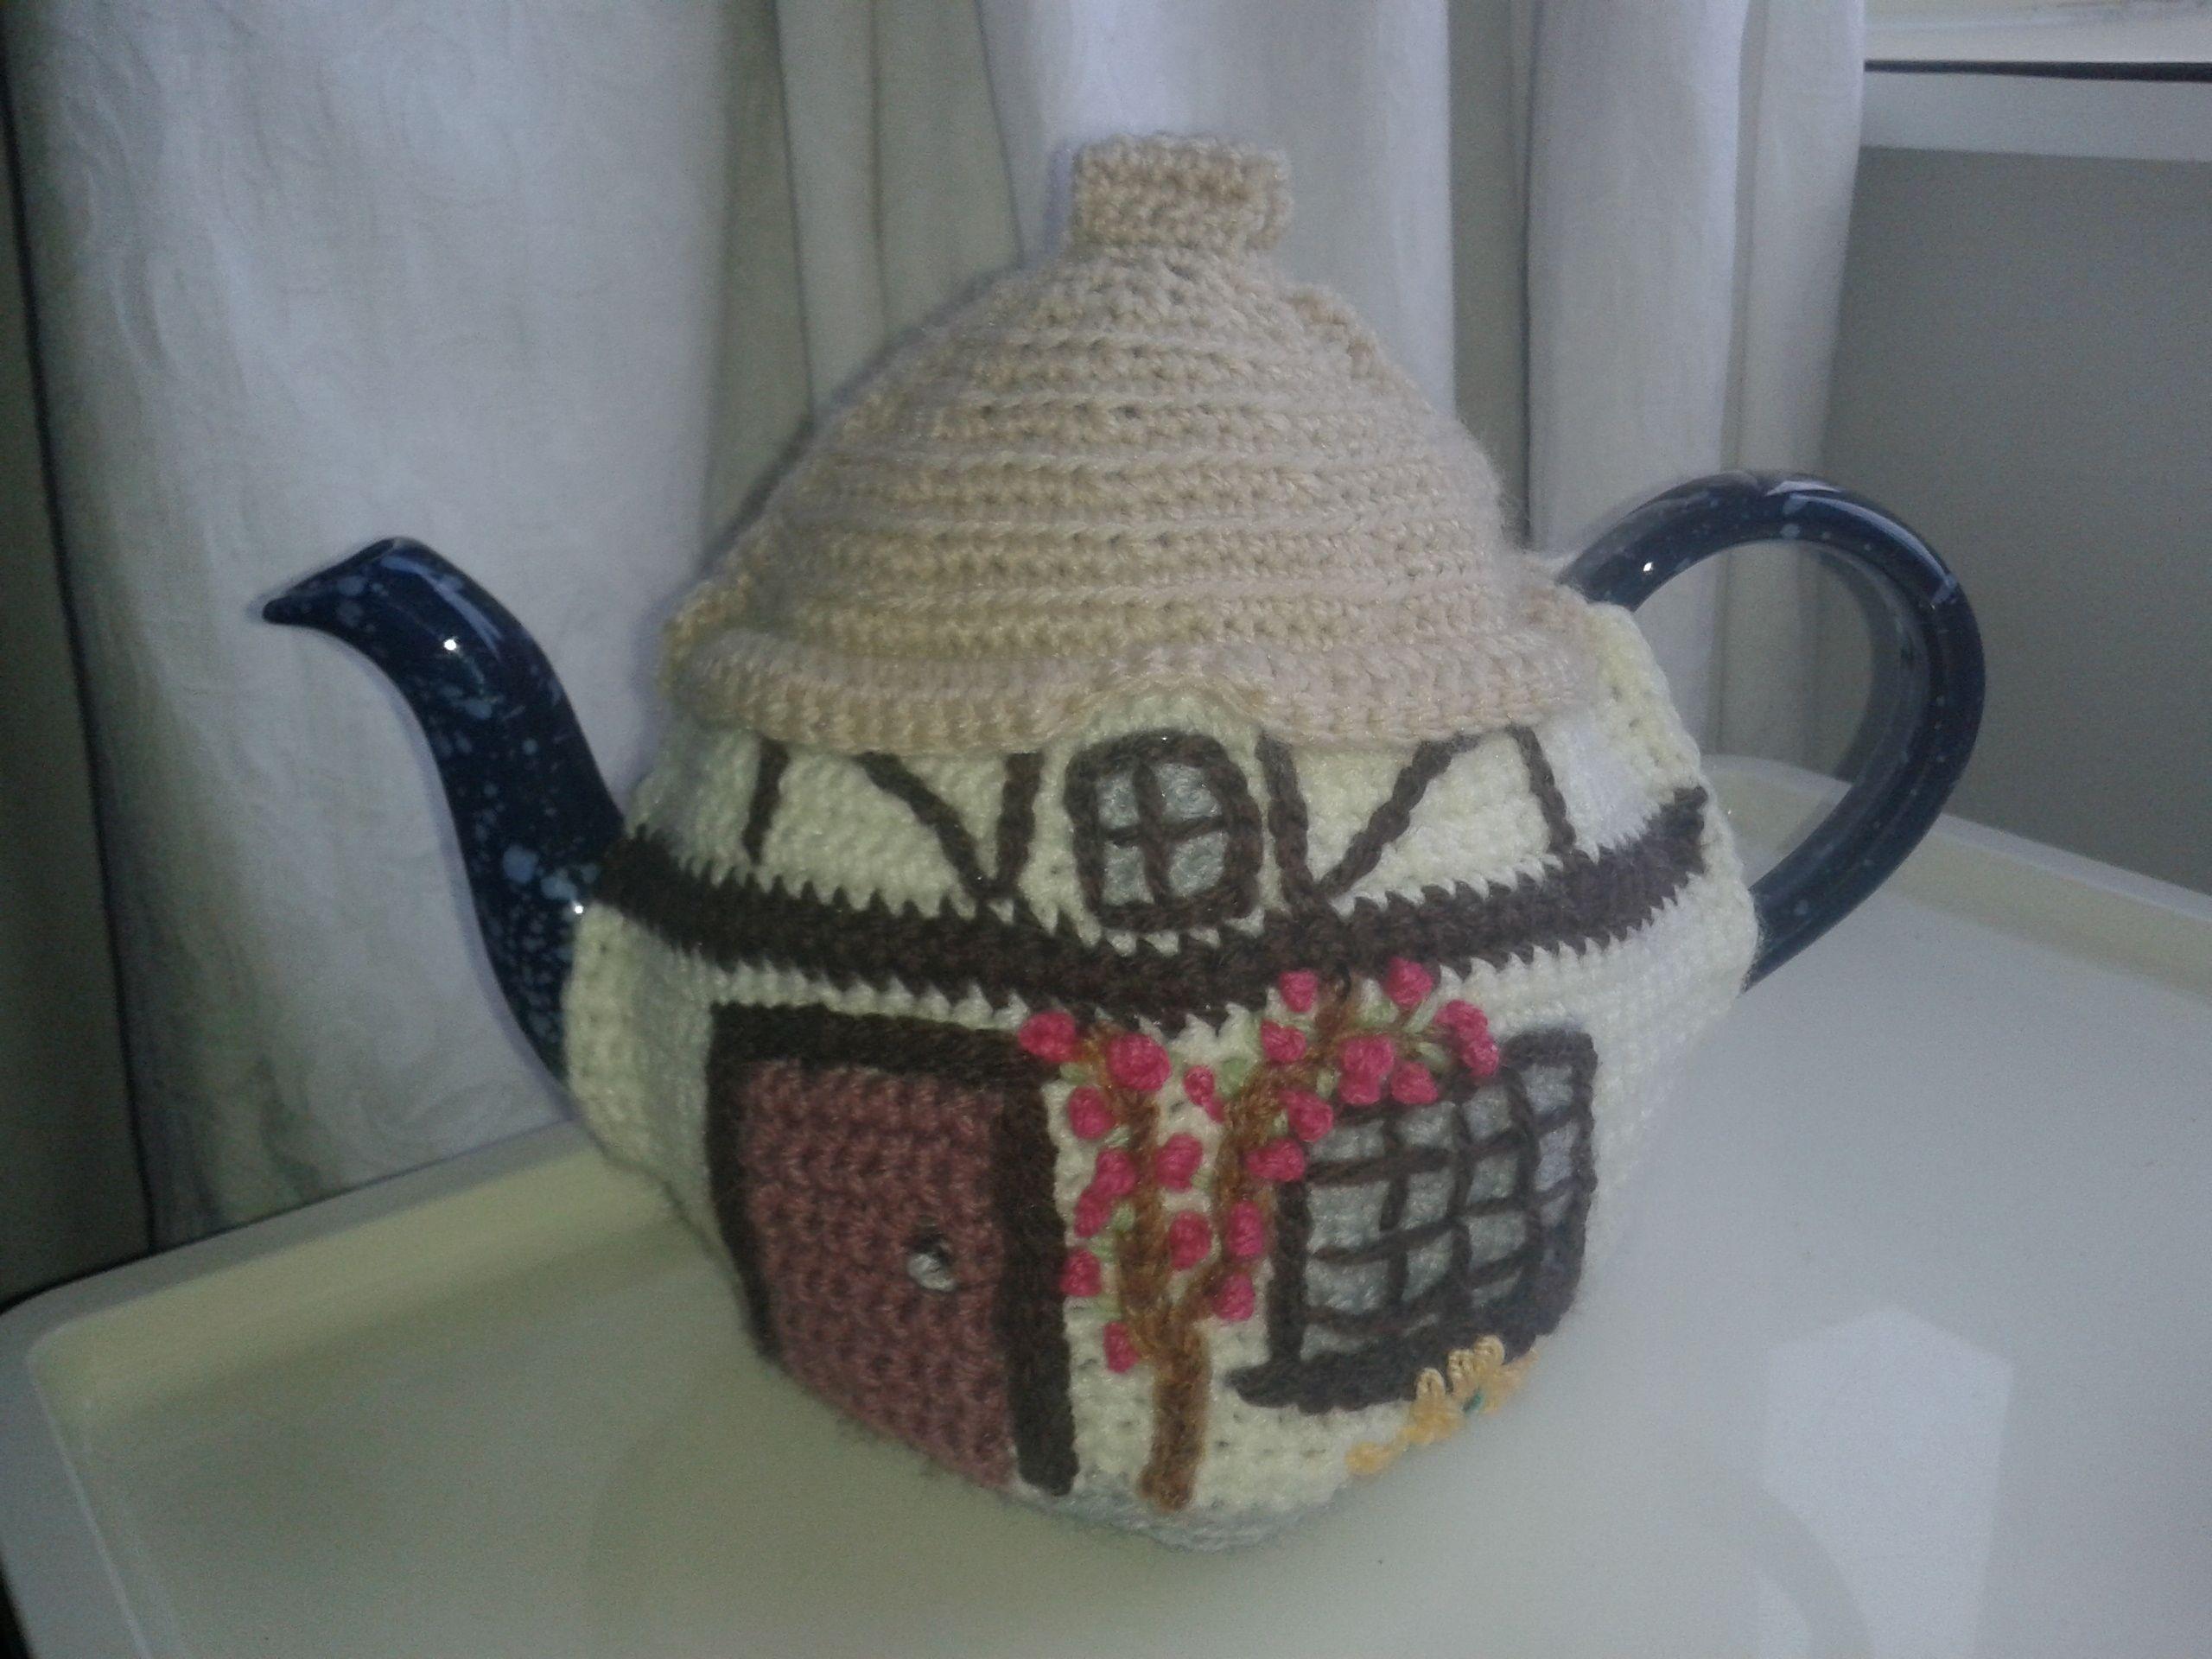 another crochet tea cosy pattern on Ravelry | patrones de puntos ...